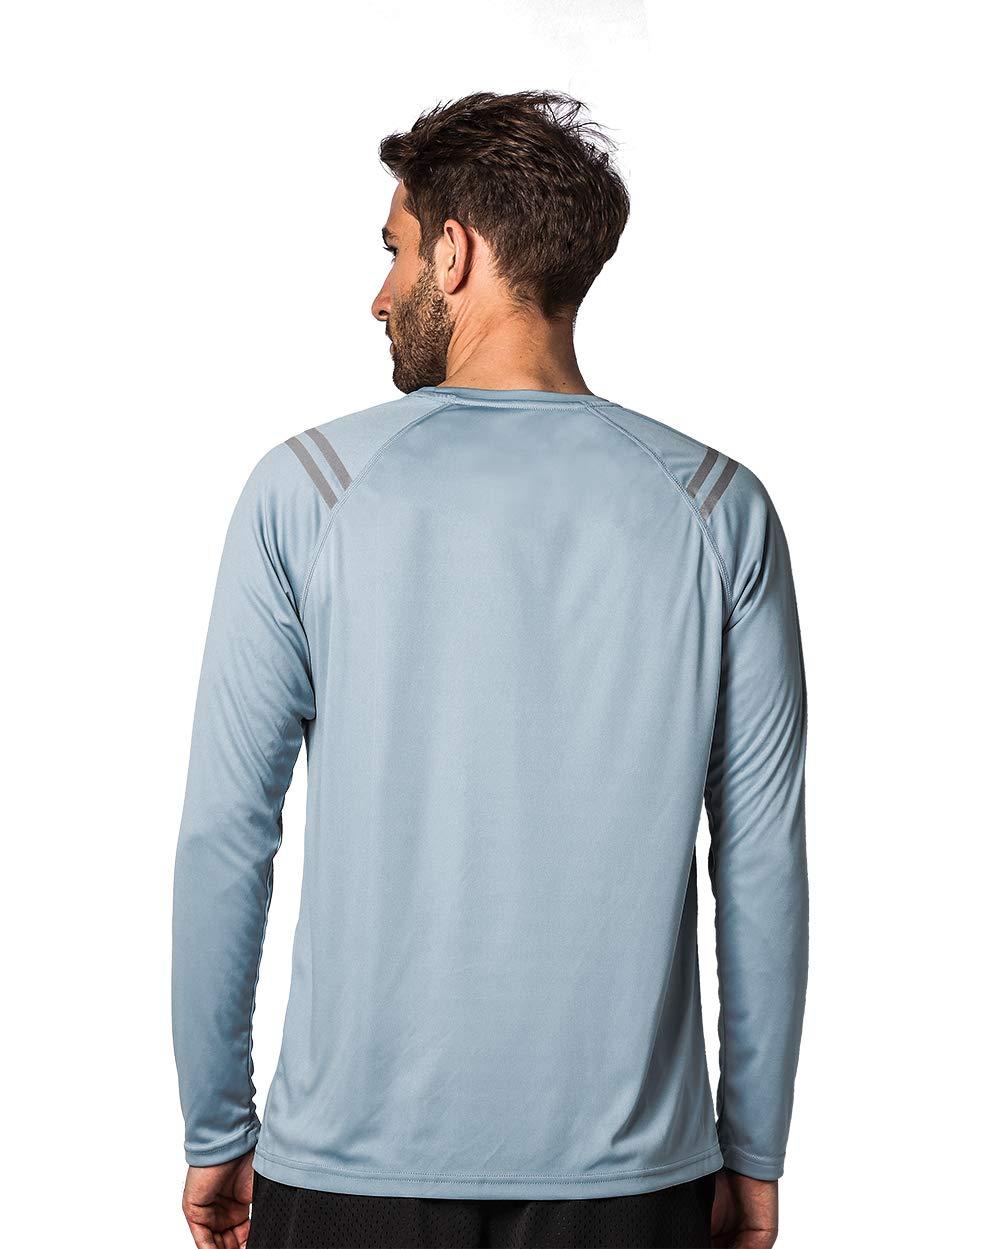 Ogeenier Camicie a Maniche Lunghe da Uomo UV Protezione Solare Atletica Surf Turismo Camping Walking T-Shirt Running UPF50